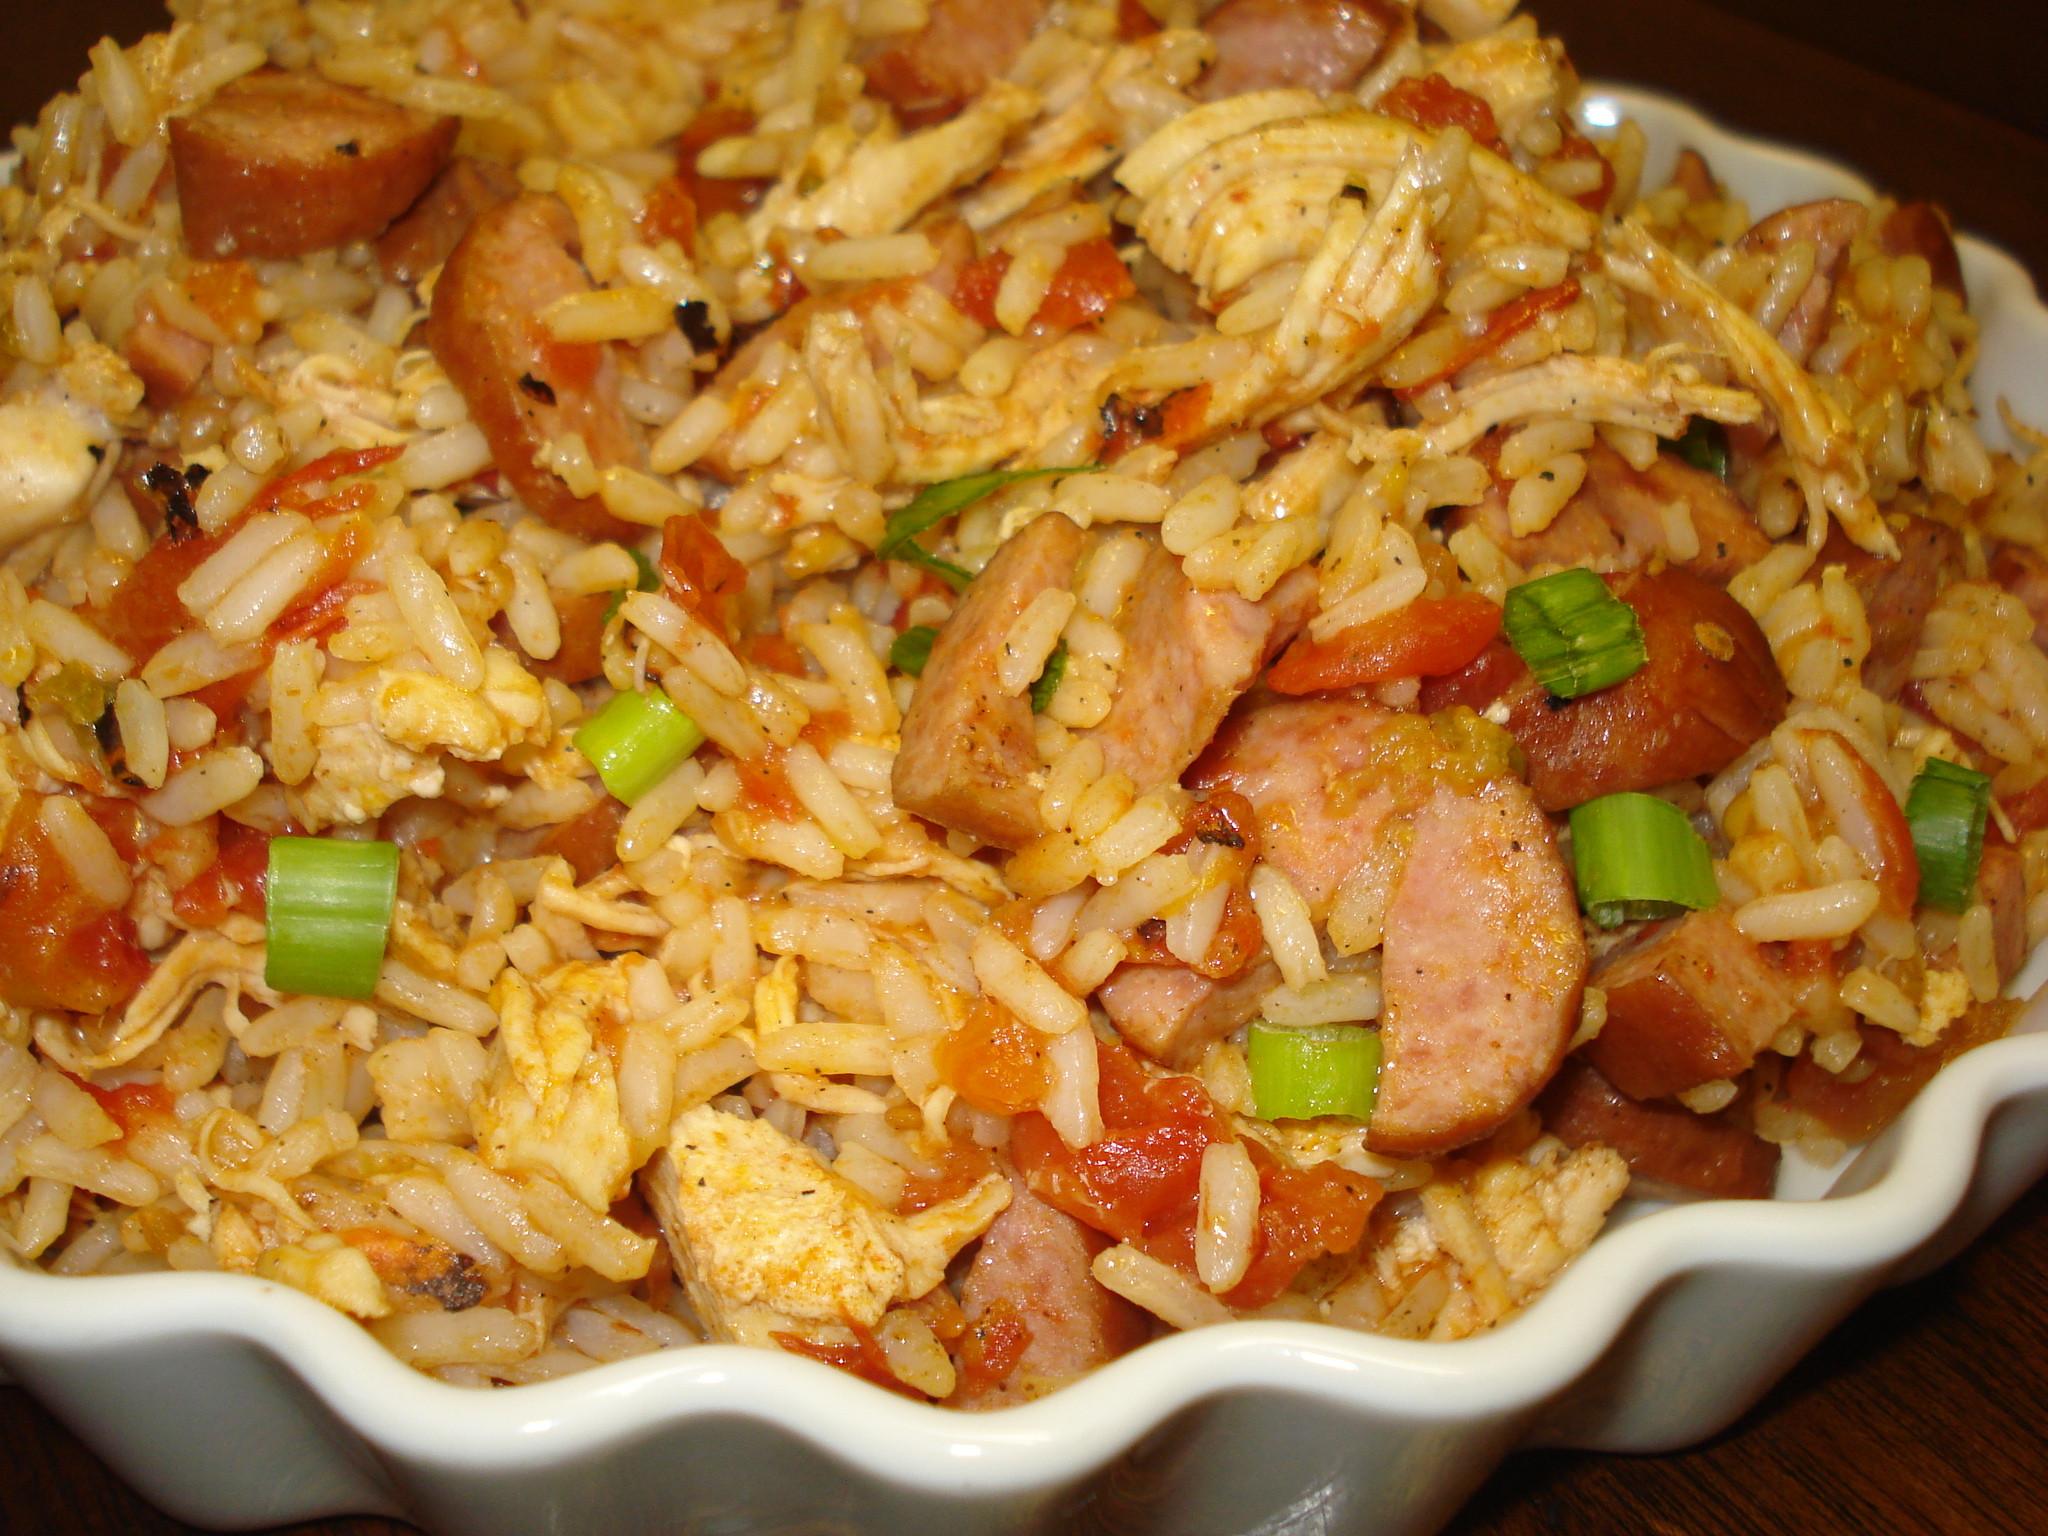 Chicken And Sausage Recipes  Chicken and Sausage Jambalaya